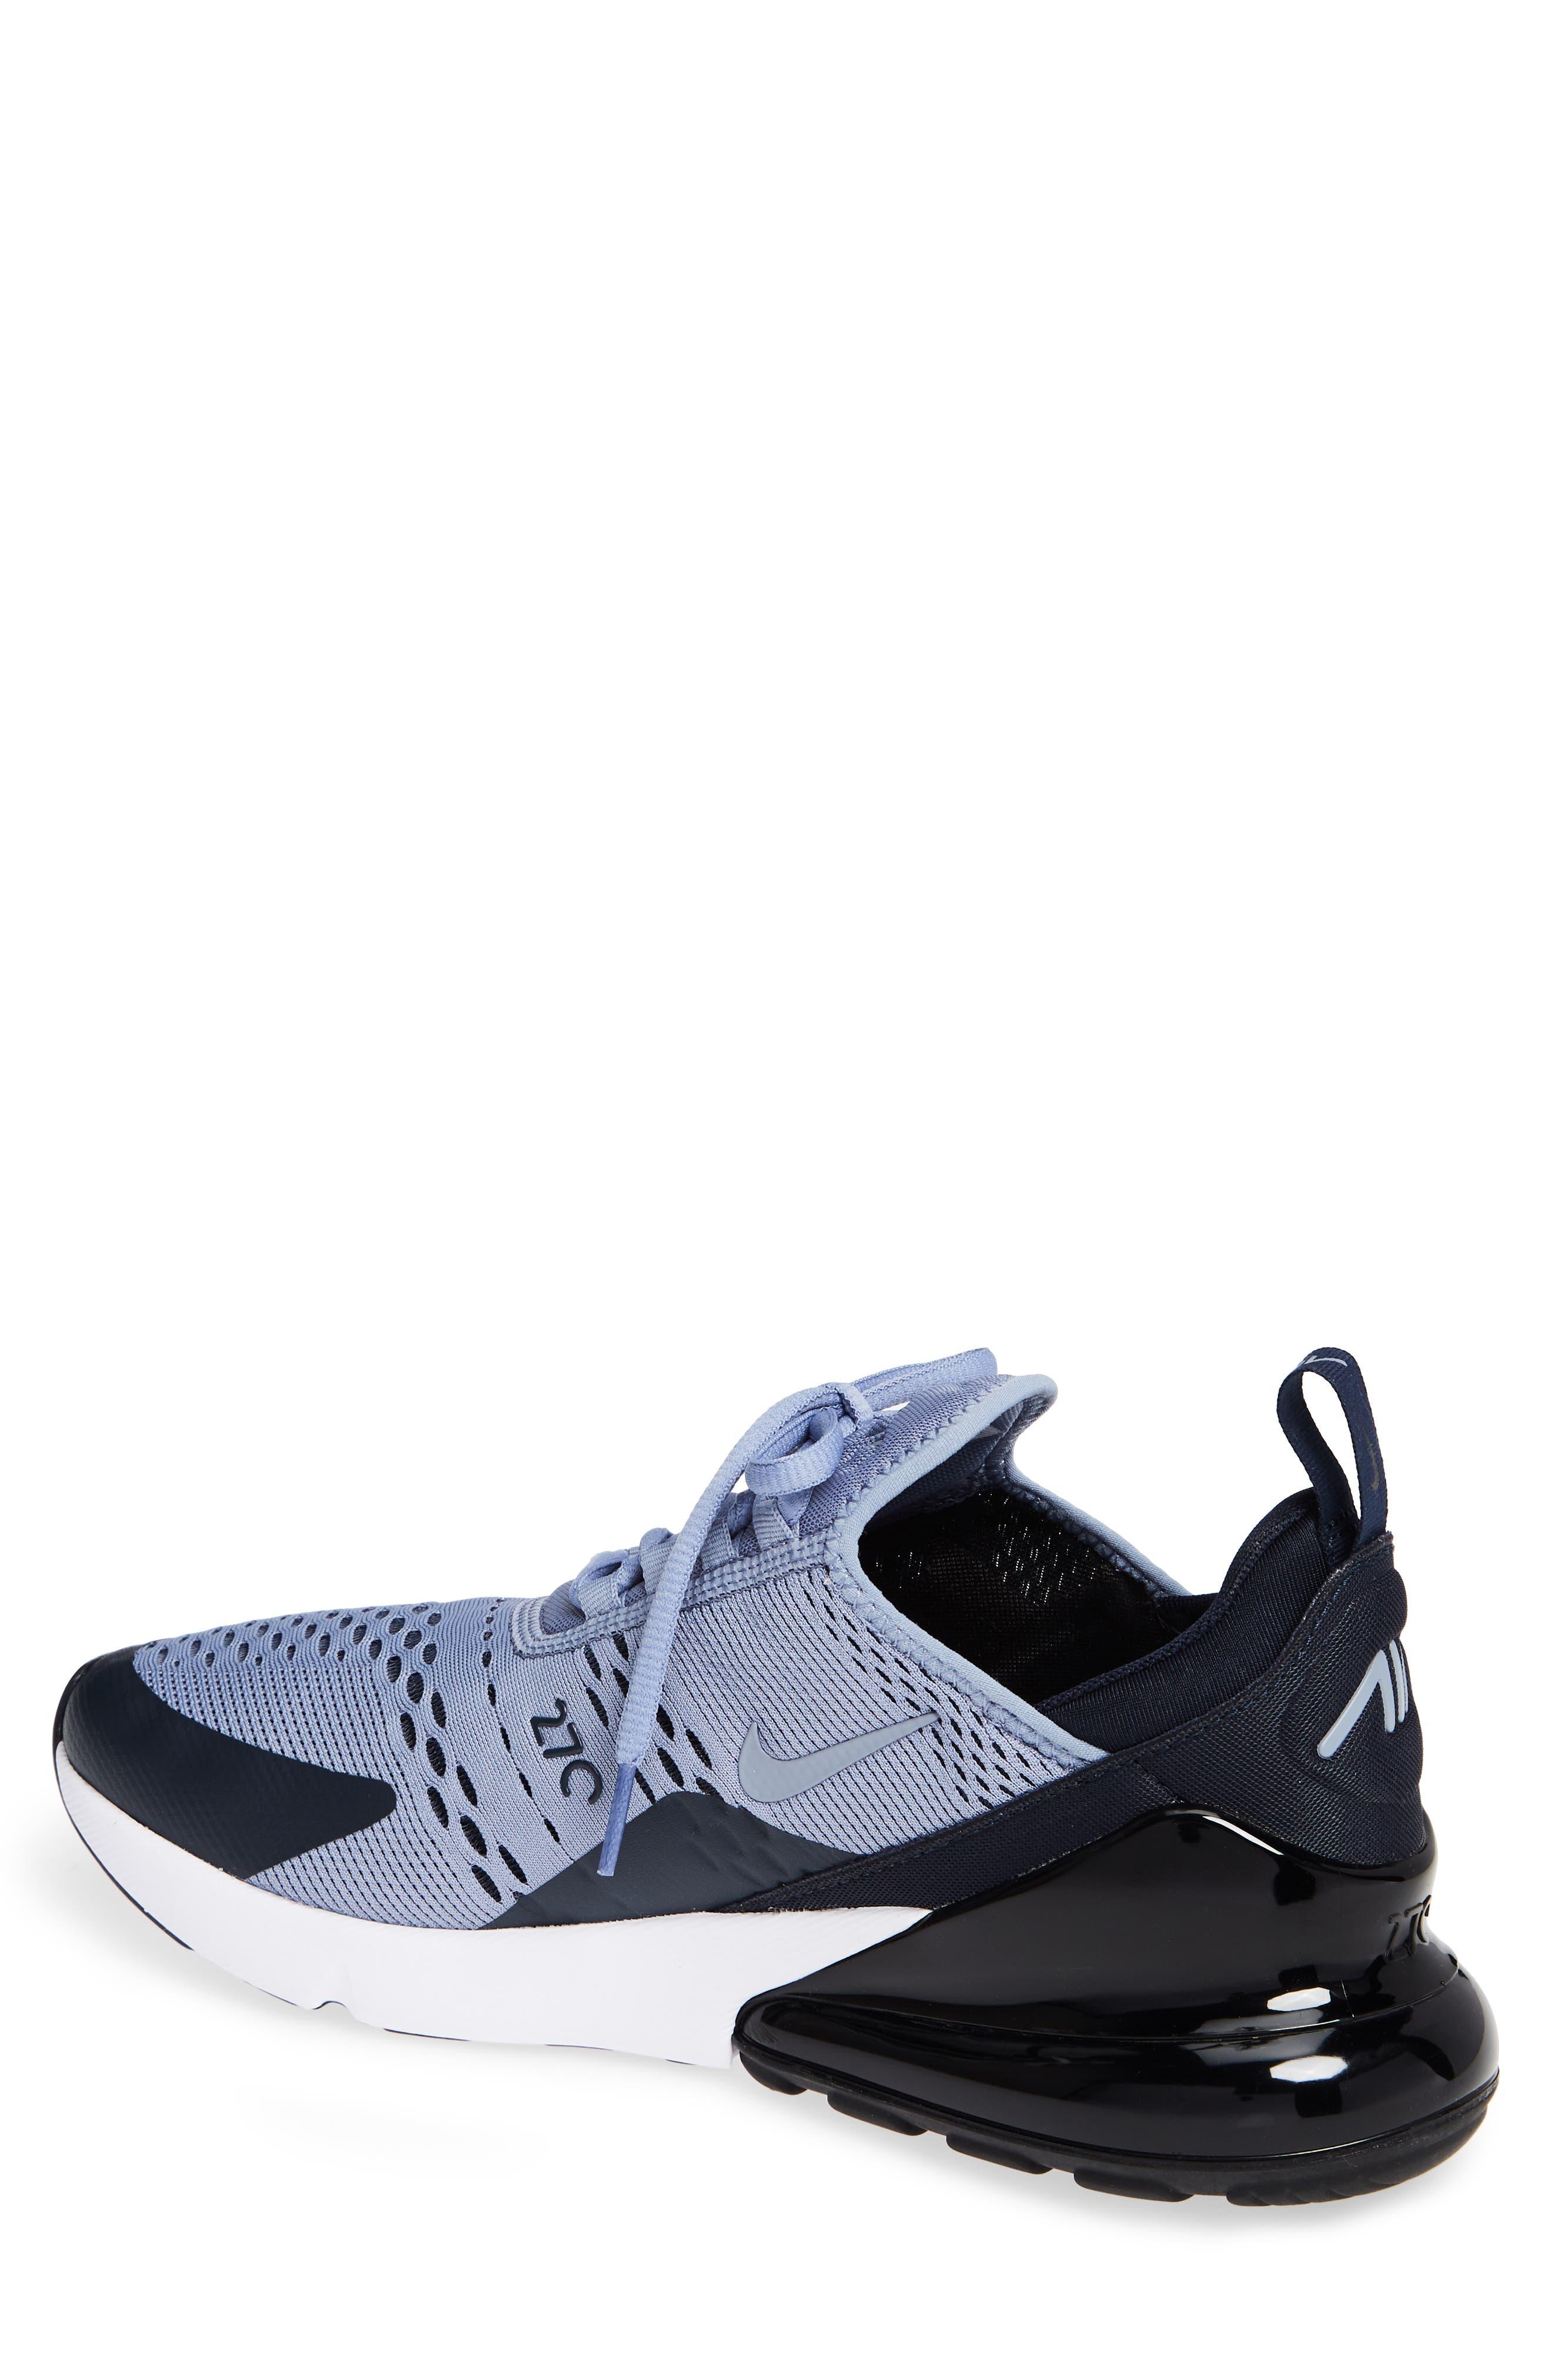 Air Max 270 Sneaker,                             Alternate thumbnail 2, color,                             ASHEN SLATE/ BLACK